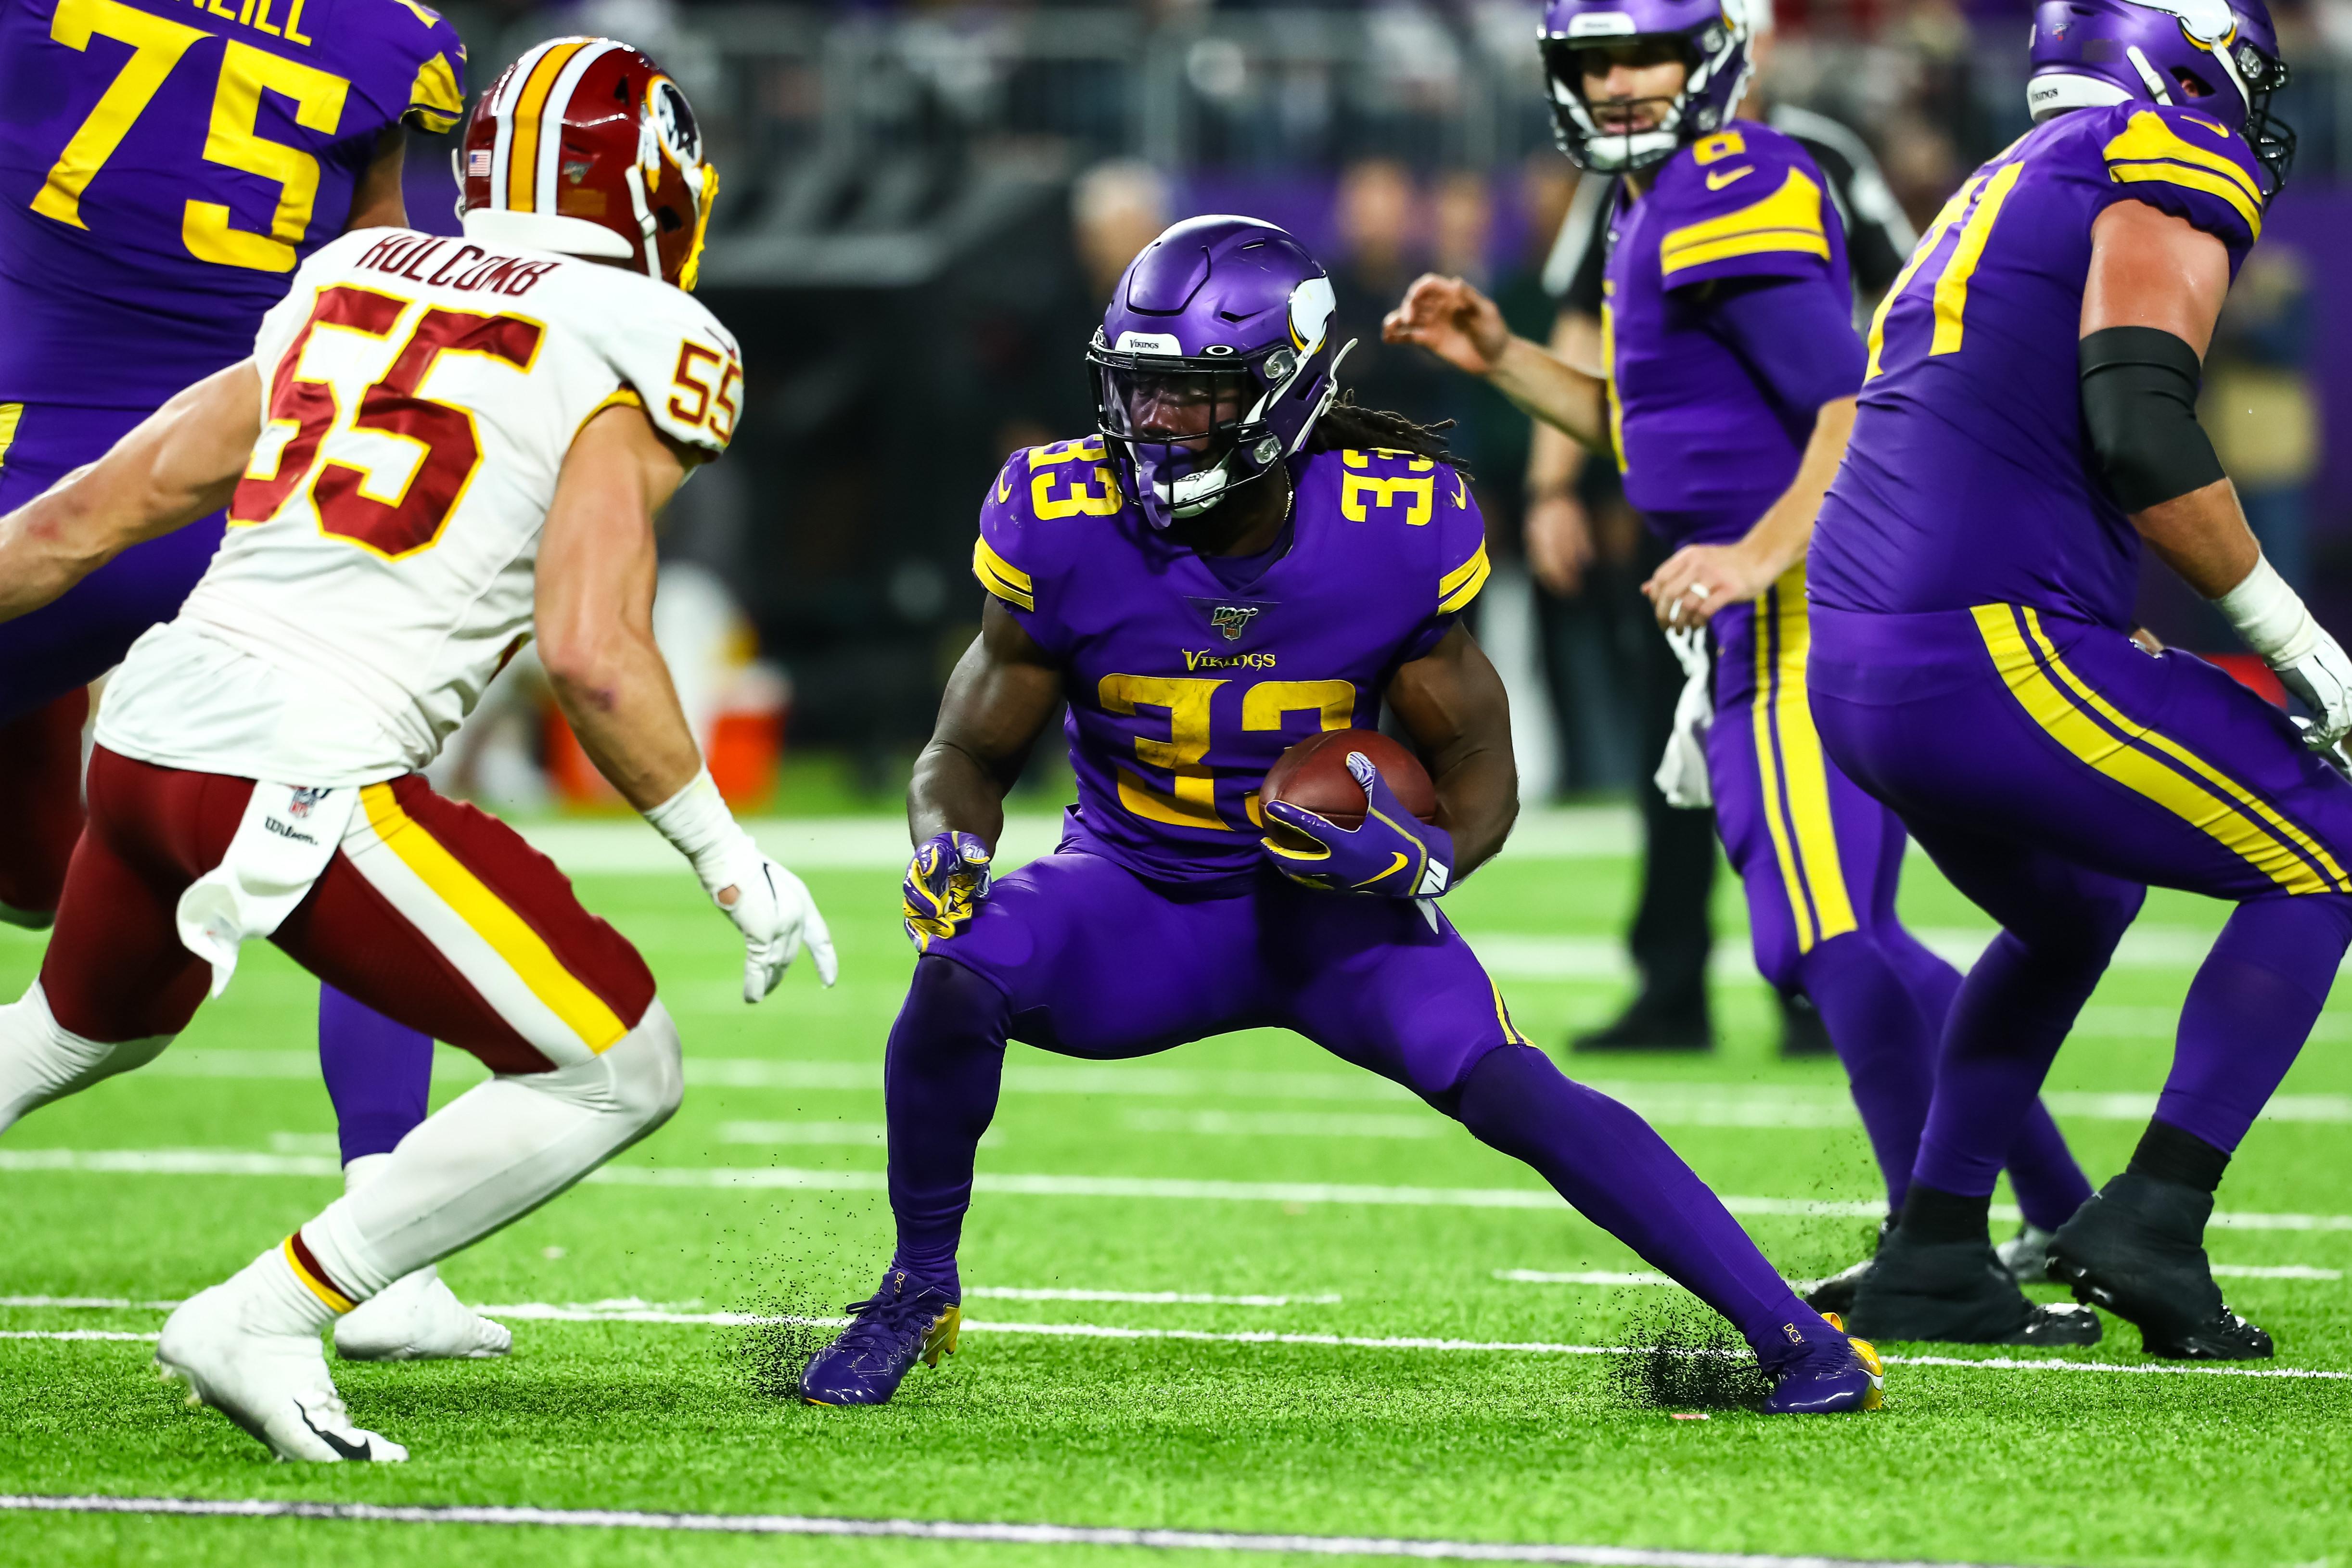 NFL: Washington Redskins at Minnesota Vikings